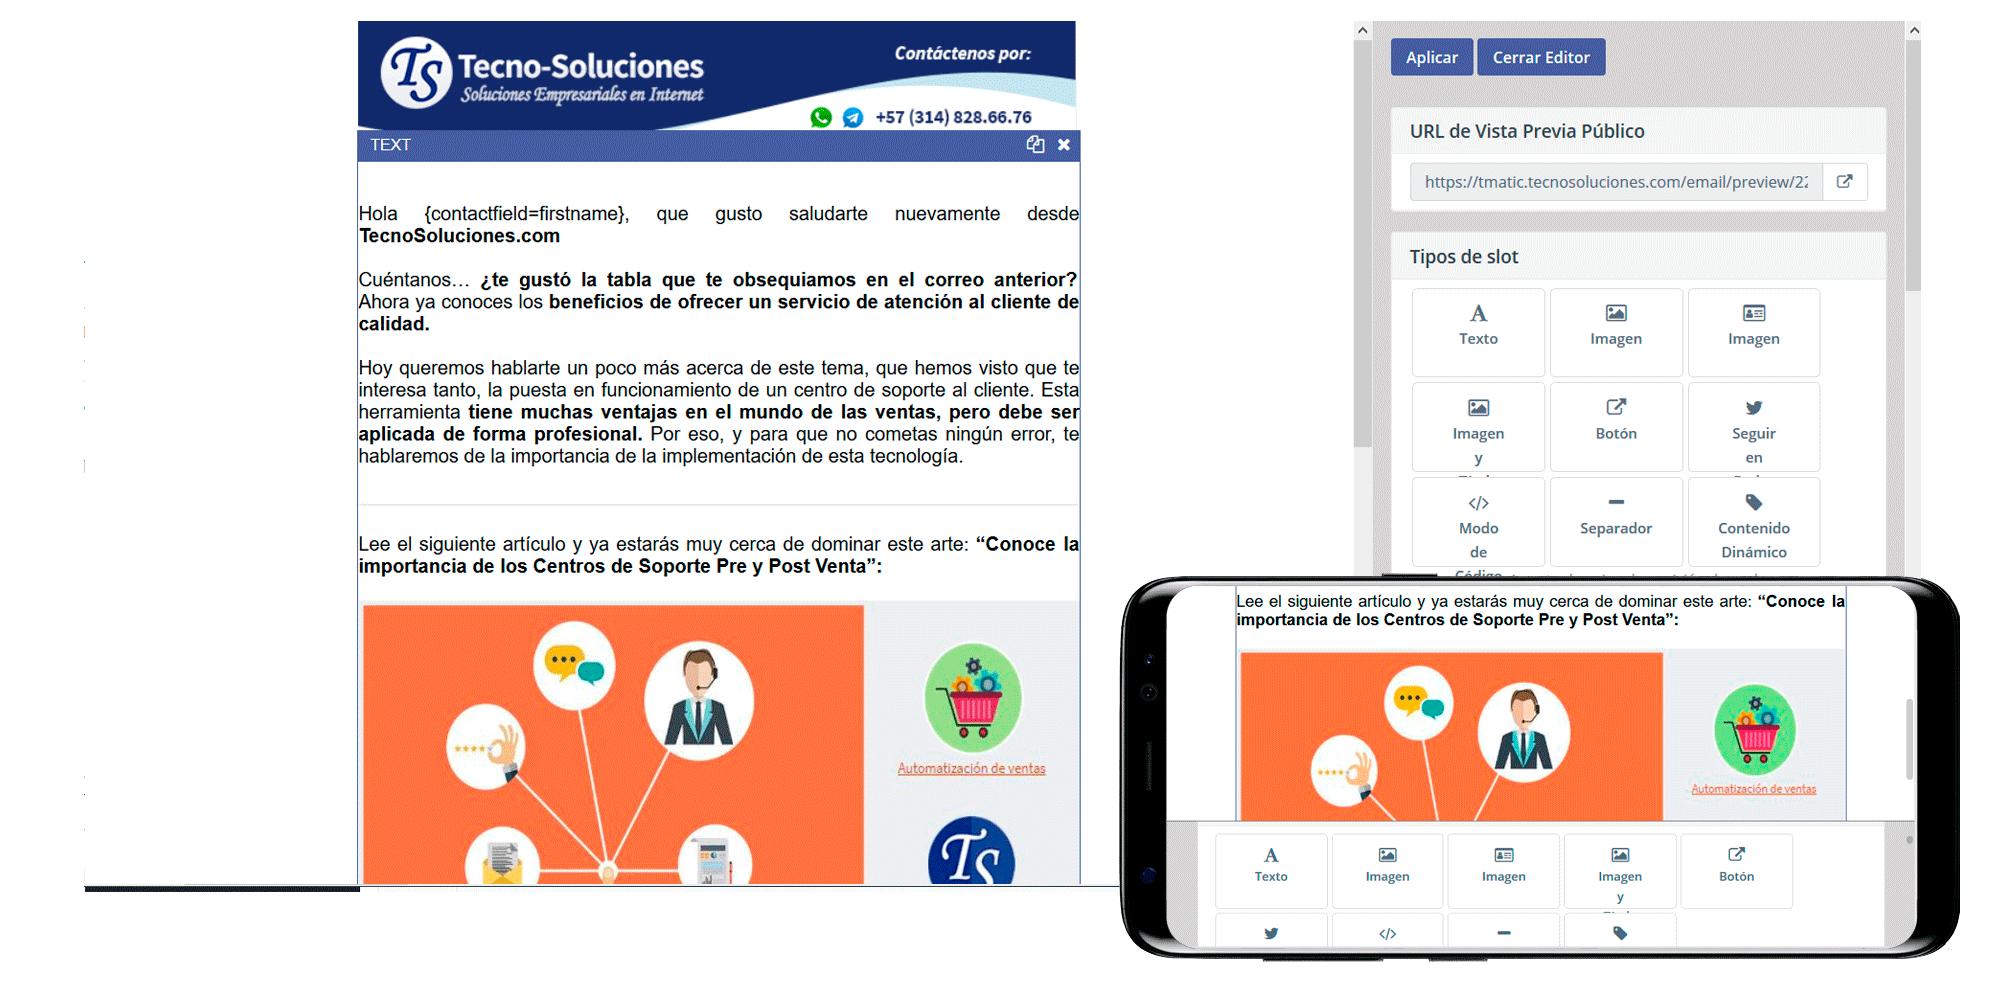 TecnoMatic - Campañas de Email Marketing automatizadas por comportamiento (marketing automation)